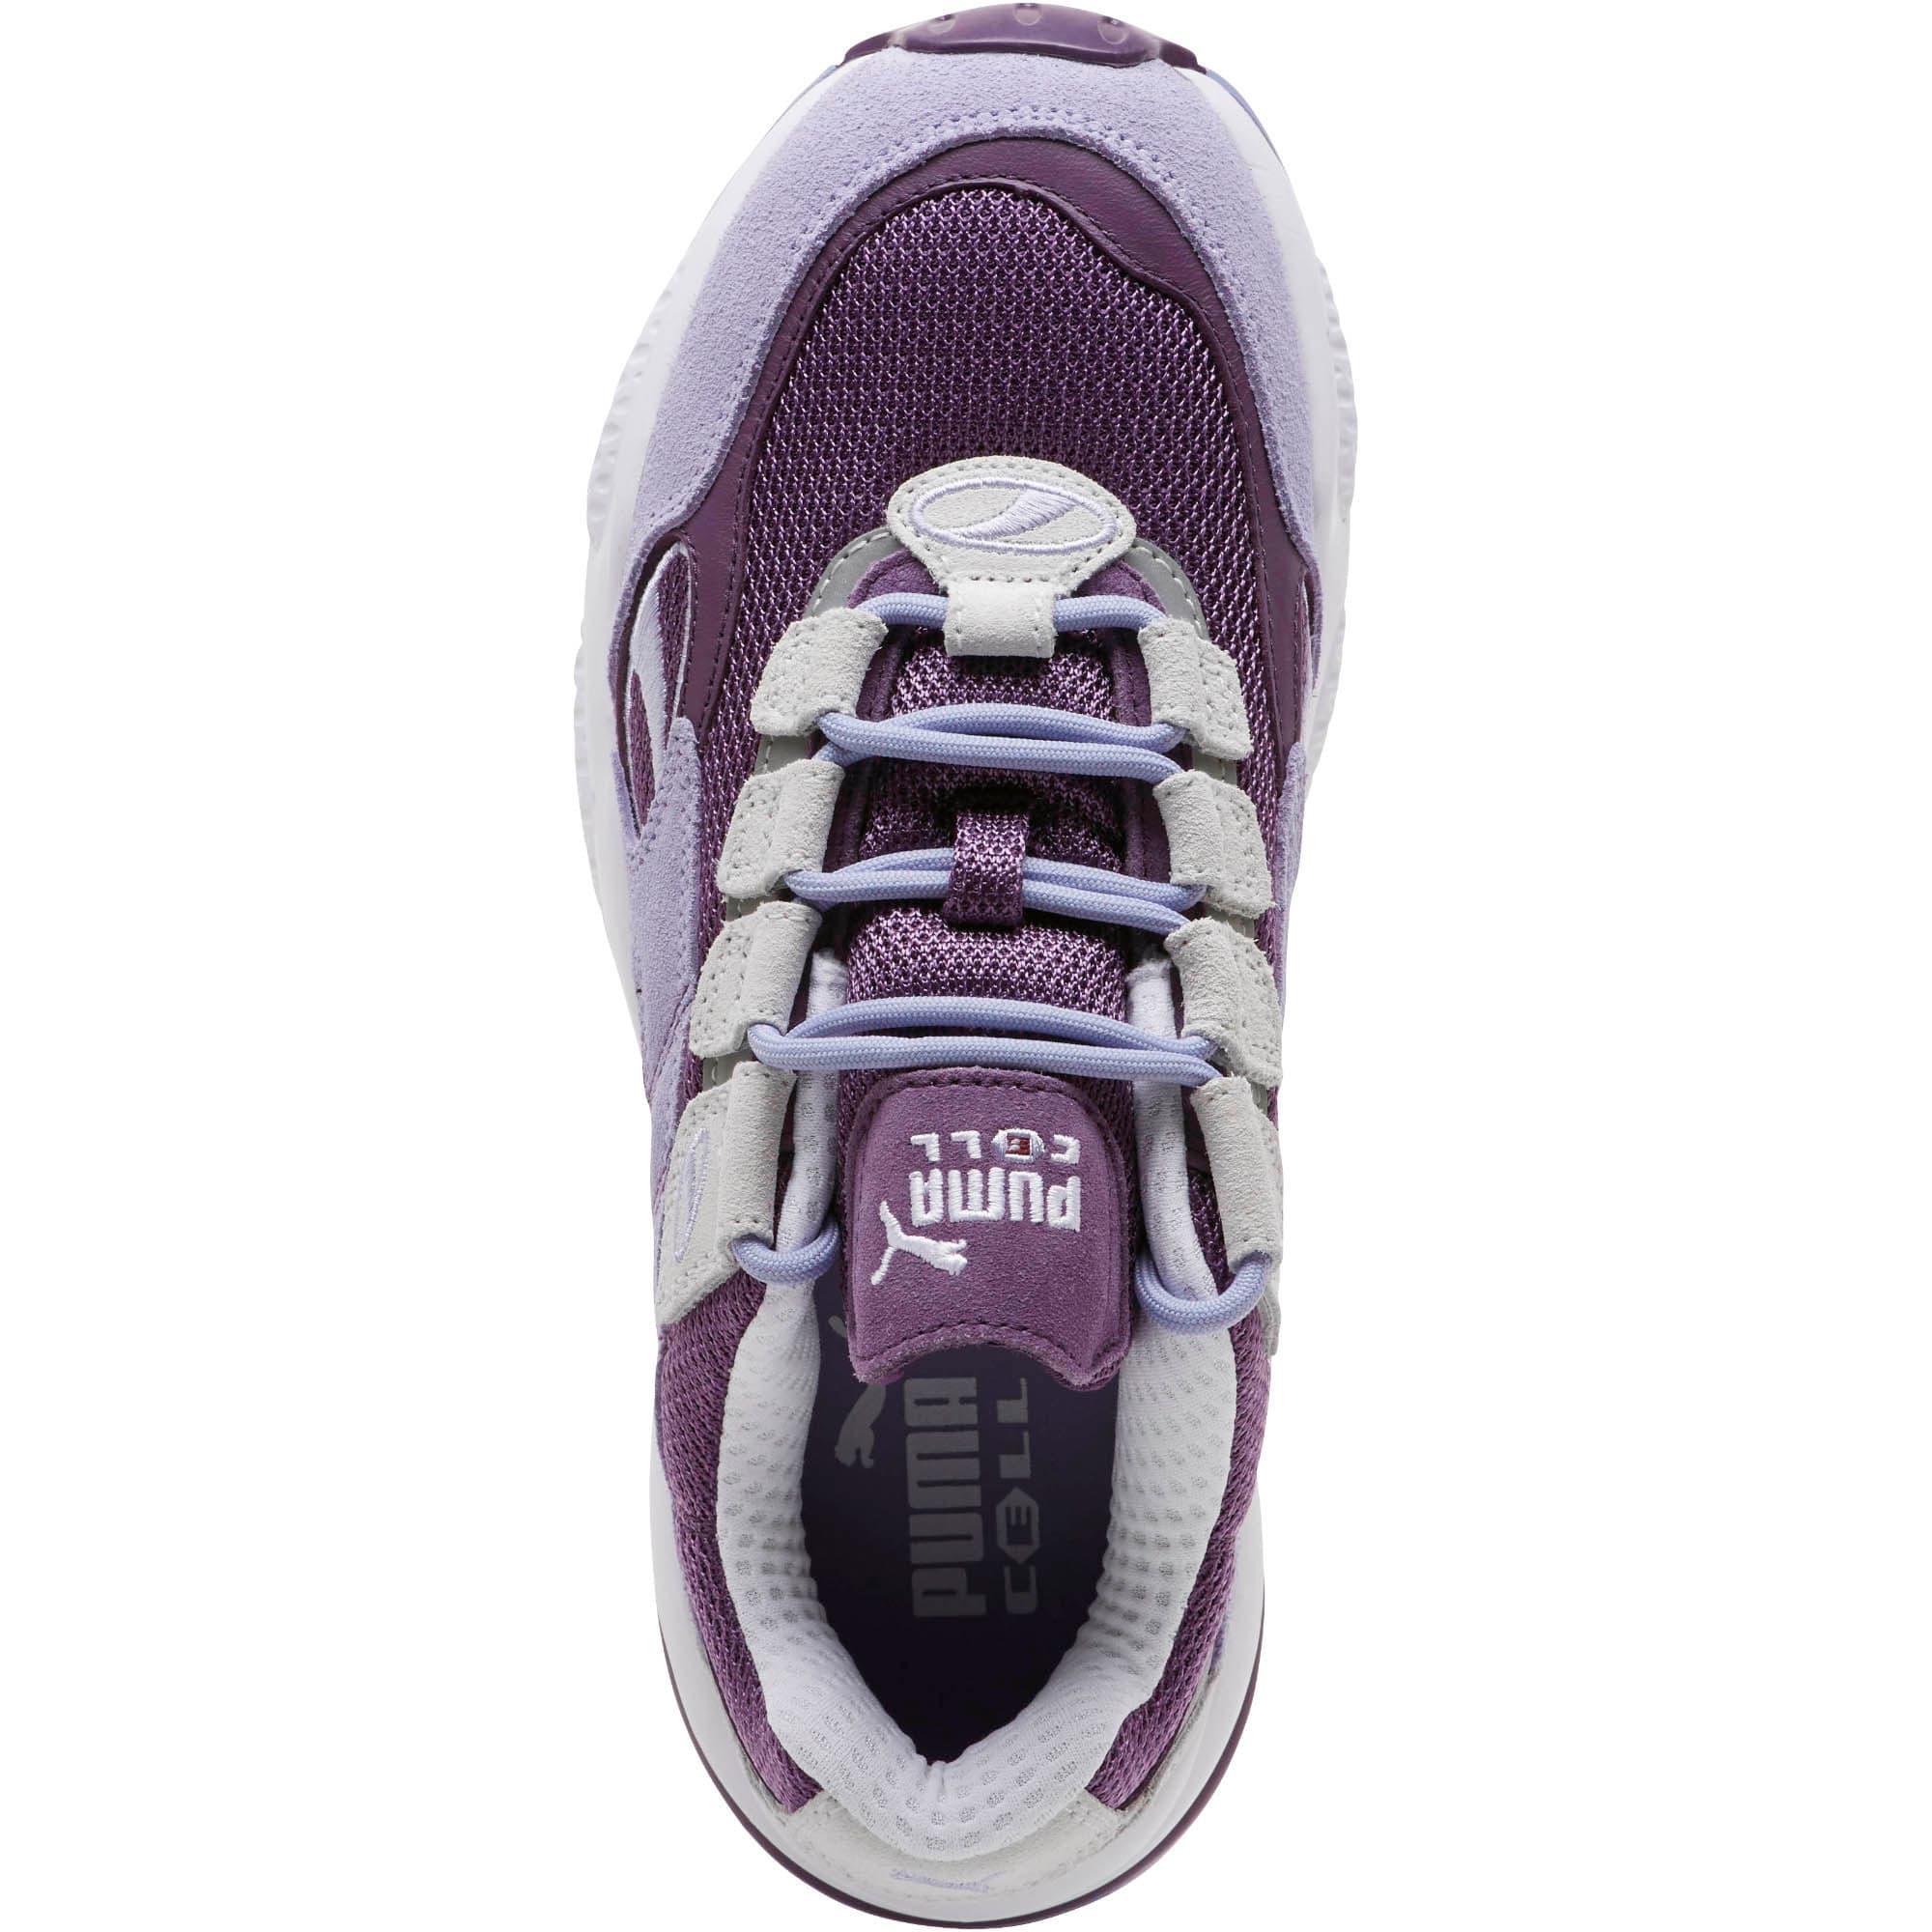 Thumbnail 5 of CELL Venom Women's Sneakers, Sweet Lavender-Indigo, medium